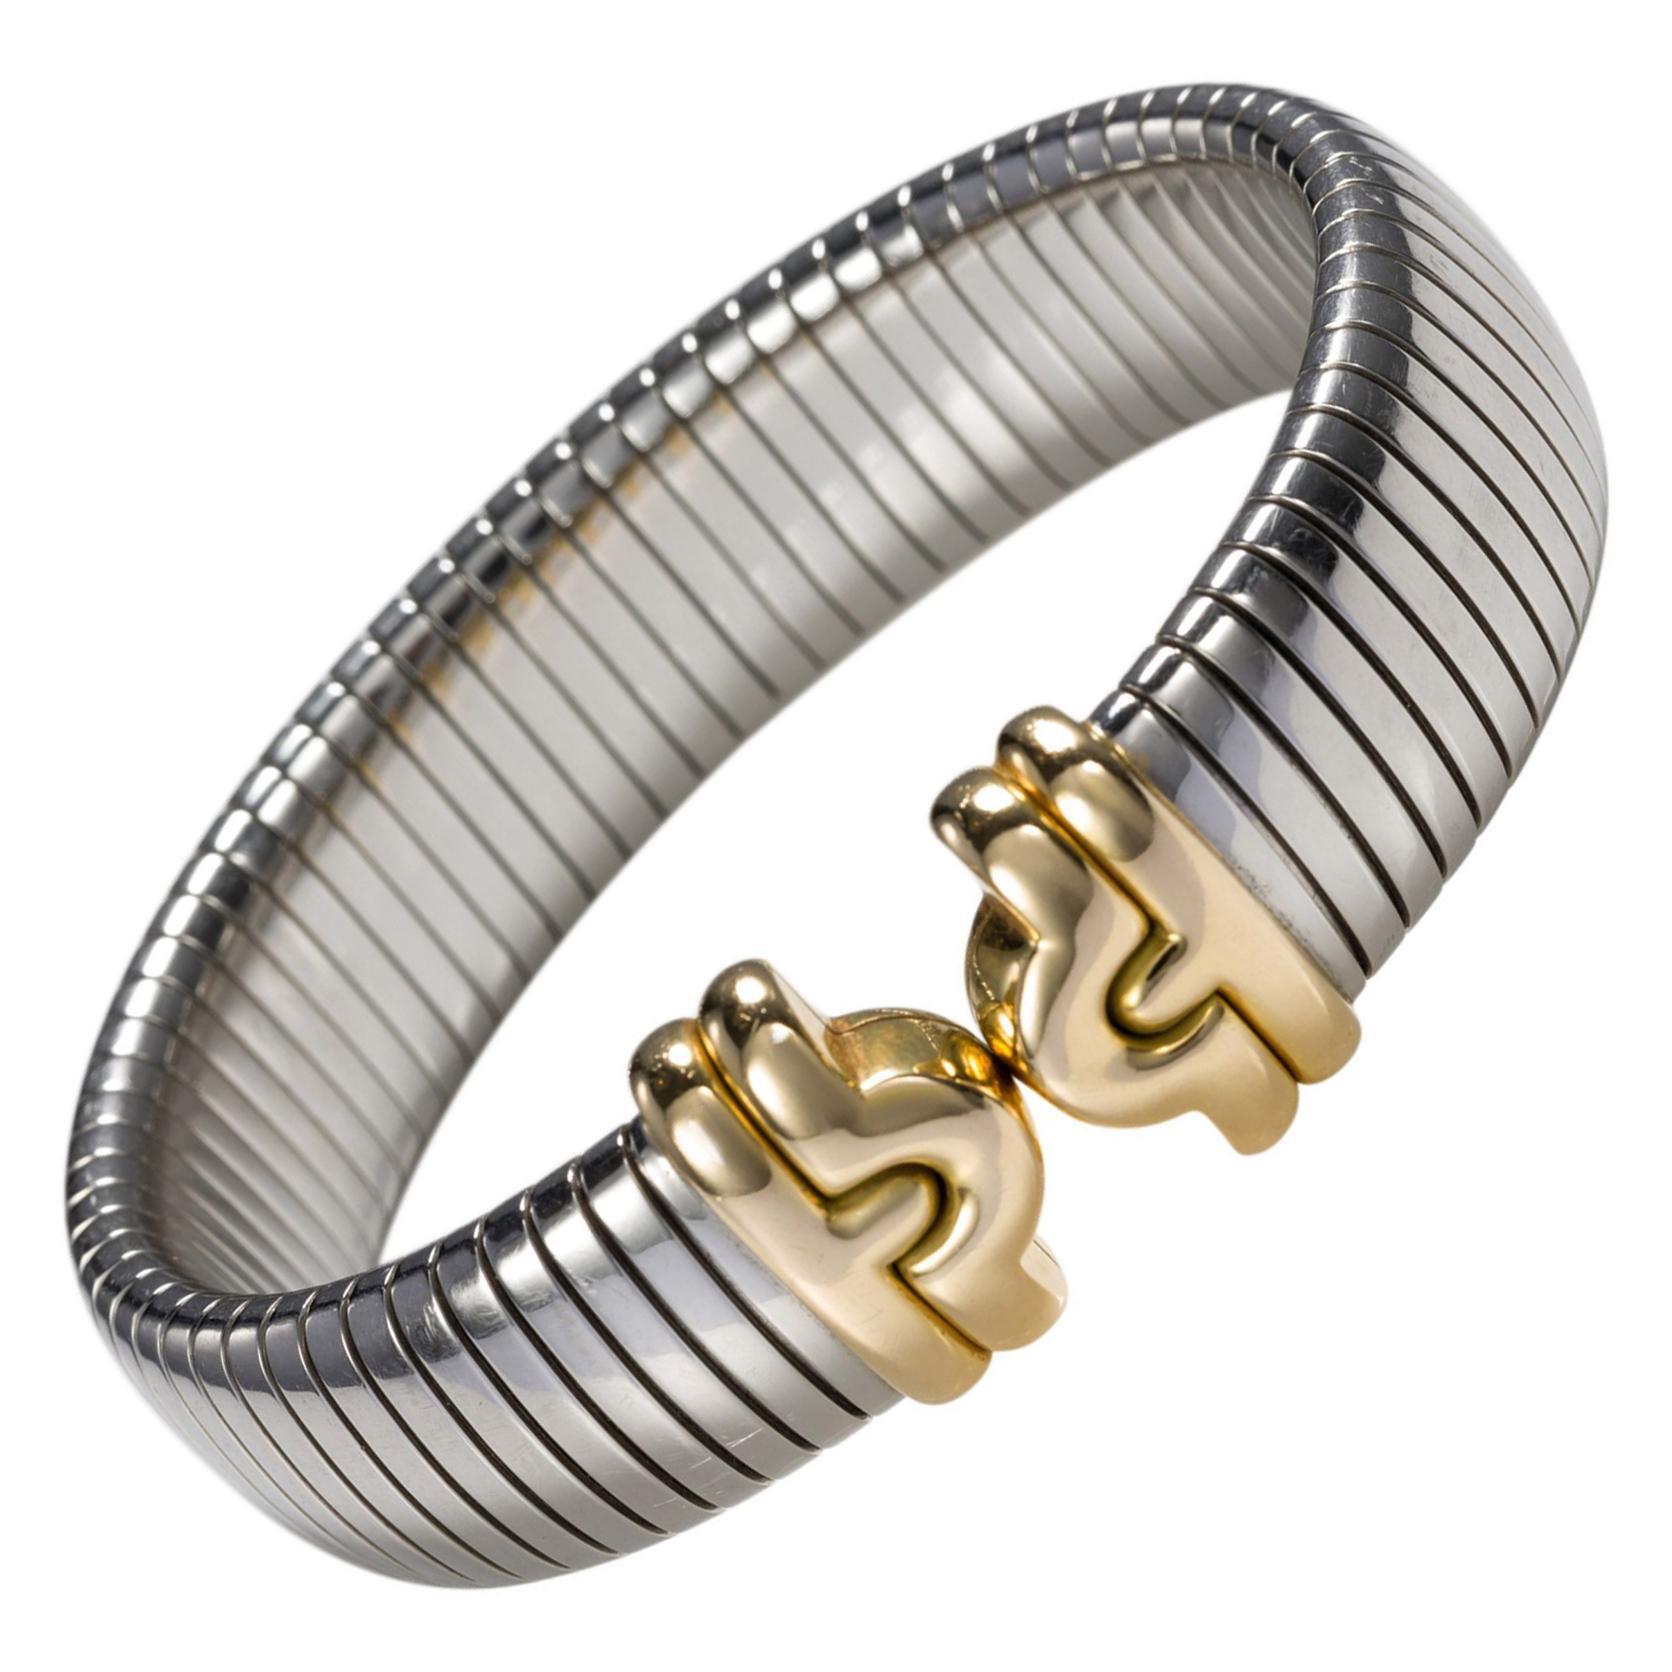 Bulgari Tubogas 18 Karat Gold and Steel Bangle Cuff Bracelet